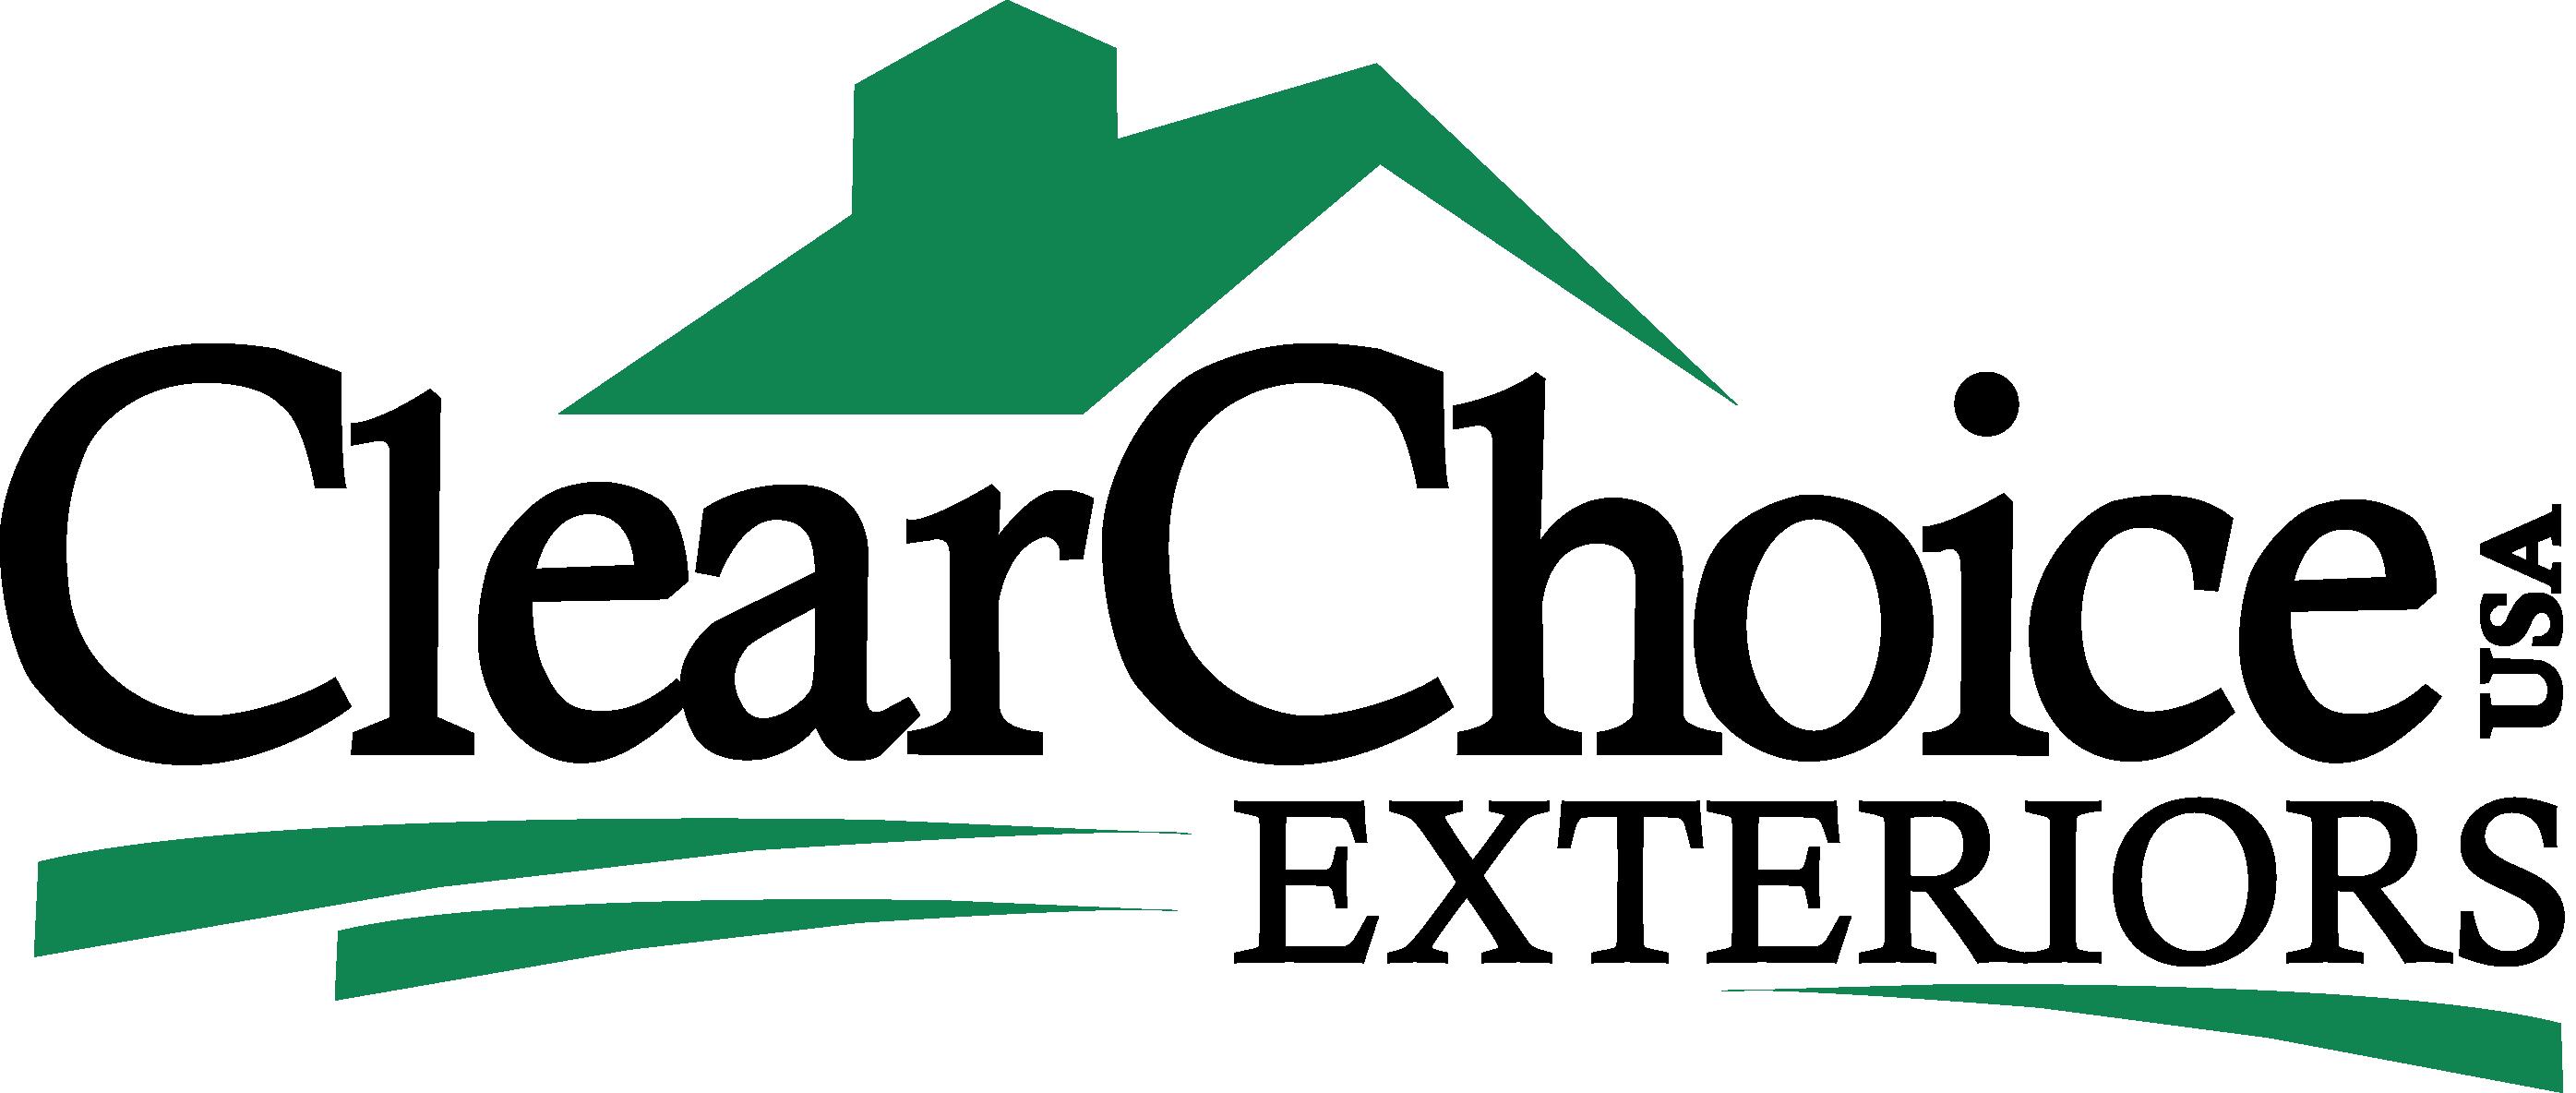 Clear Choice Usa 2019 Khts Santa Clarita Home And Garden Show Home And Garden Shows In